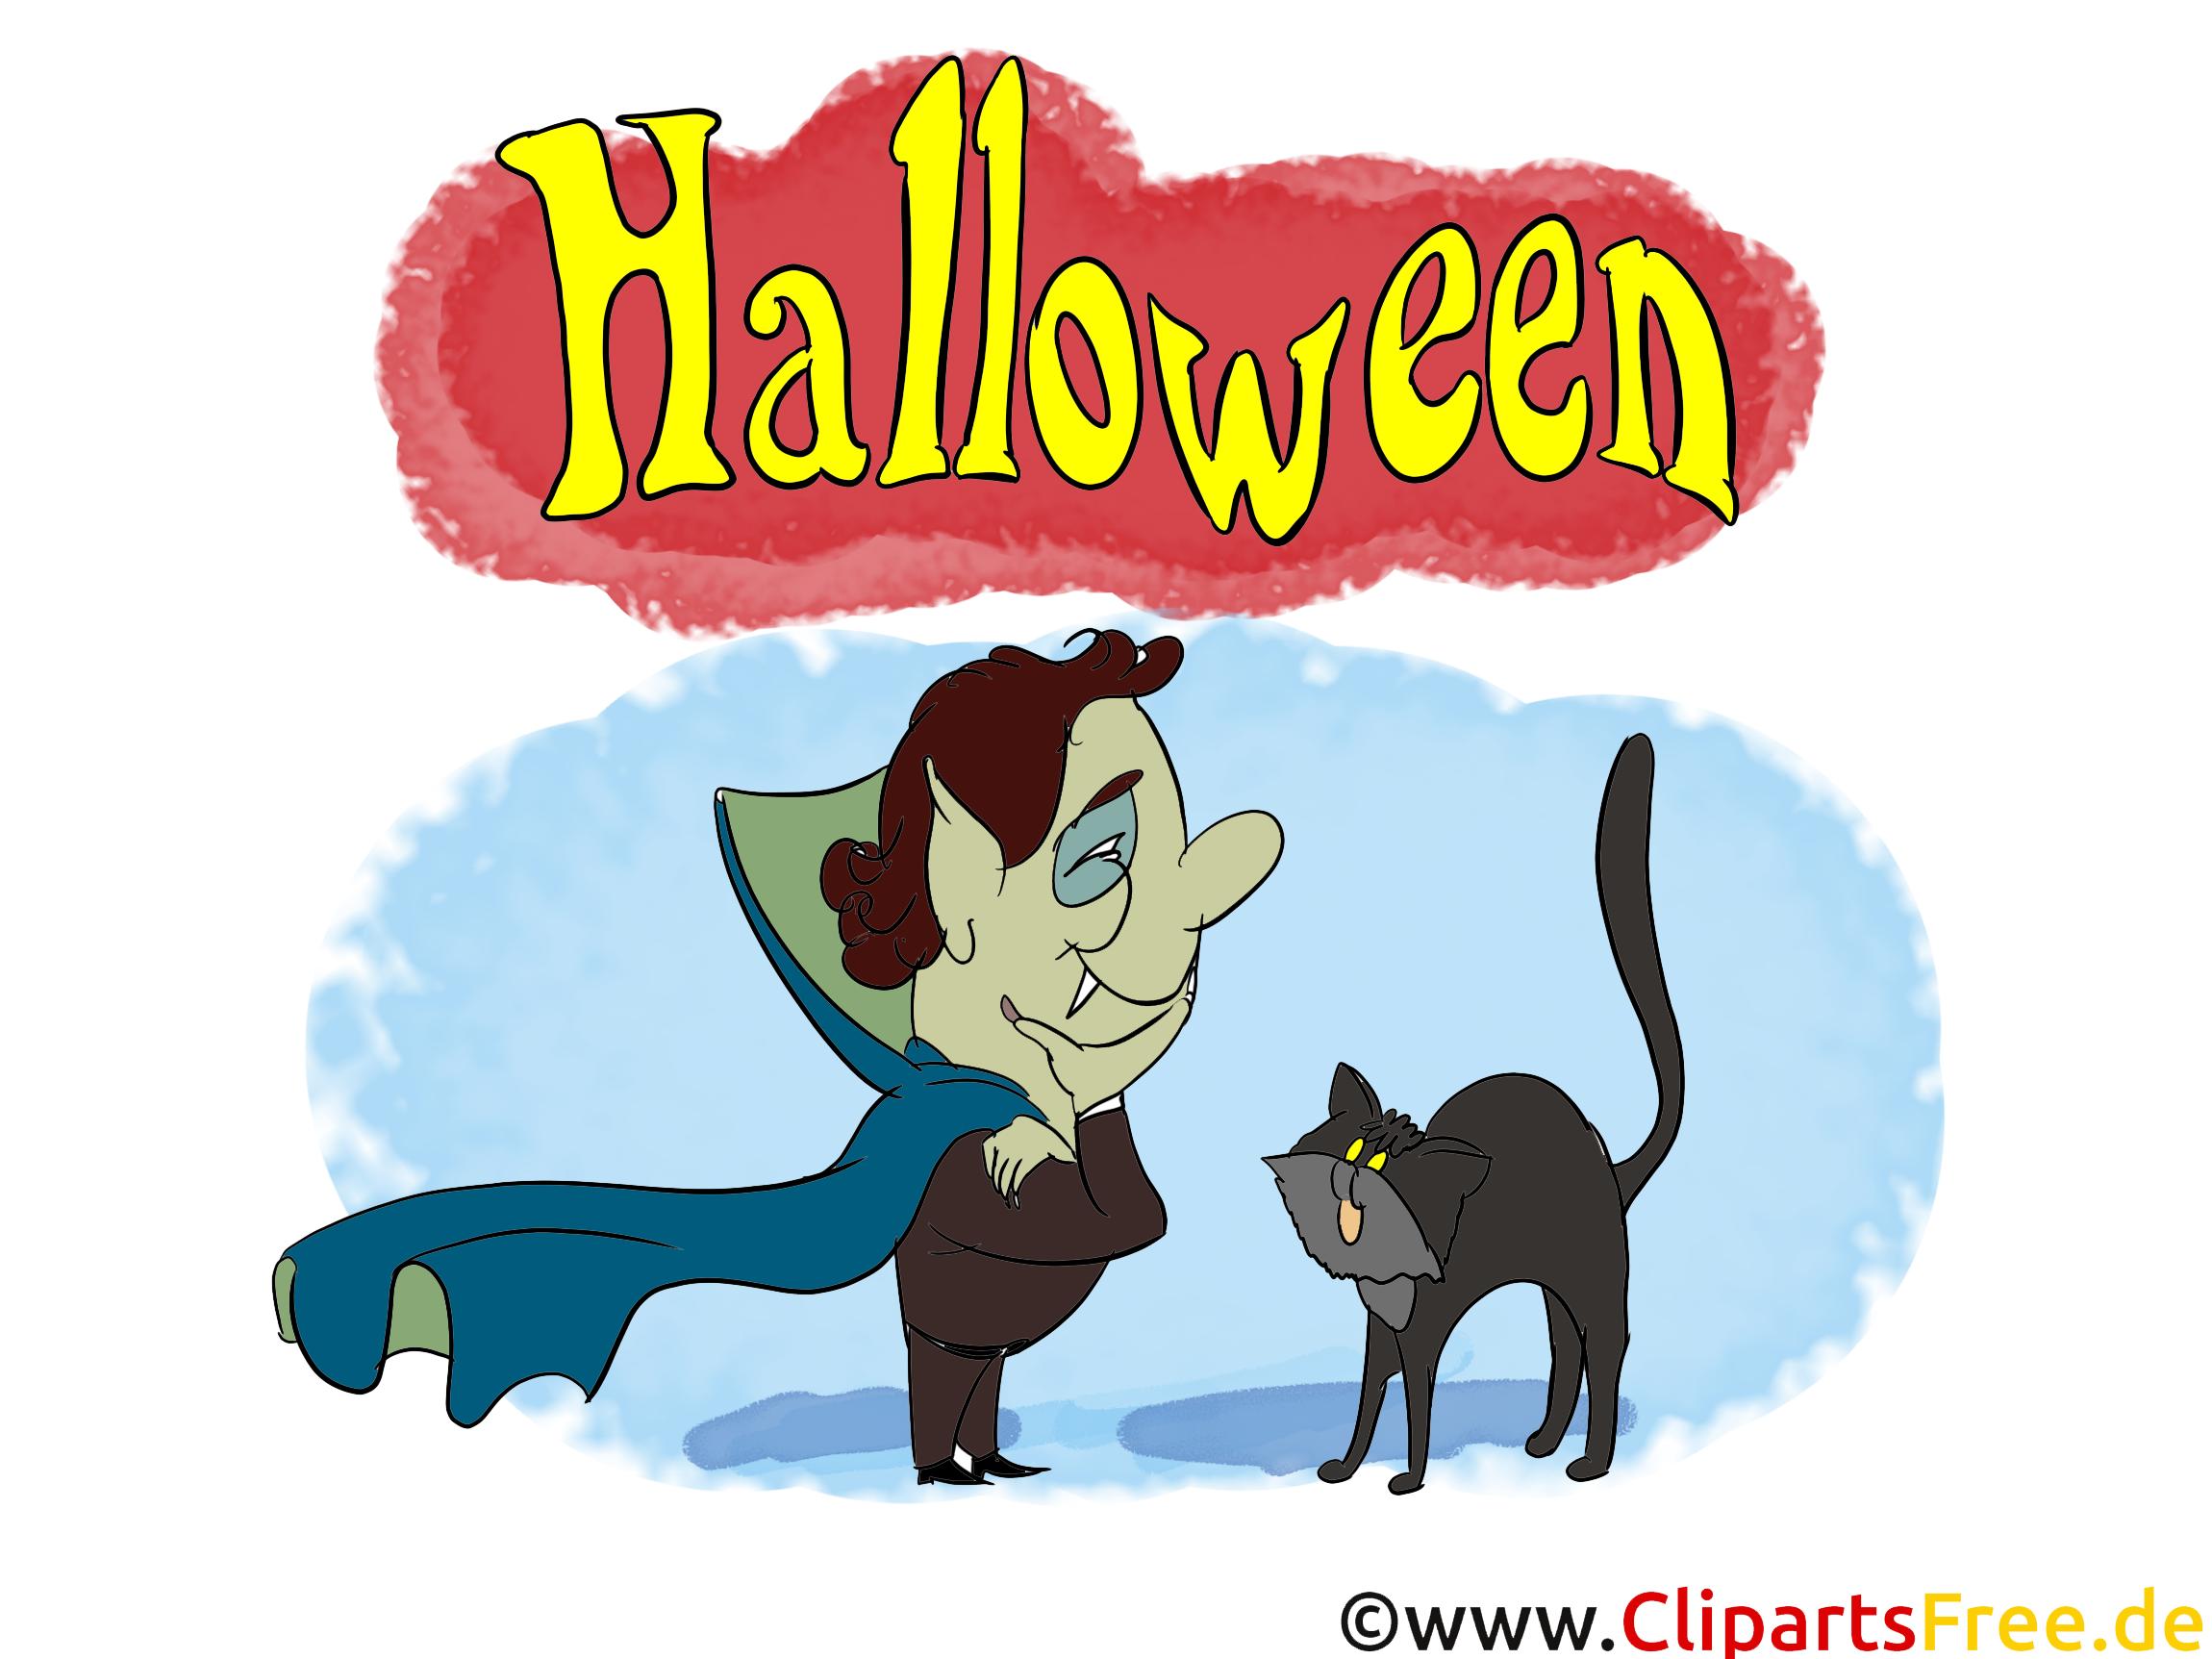 Haloween Clipart - Illustrationen, Bilder, Grafiken, Cliparts, Comics, Cartoons zu Halloween